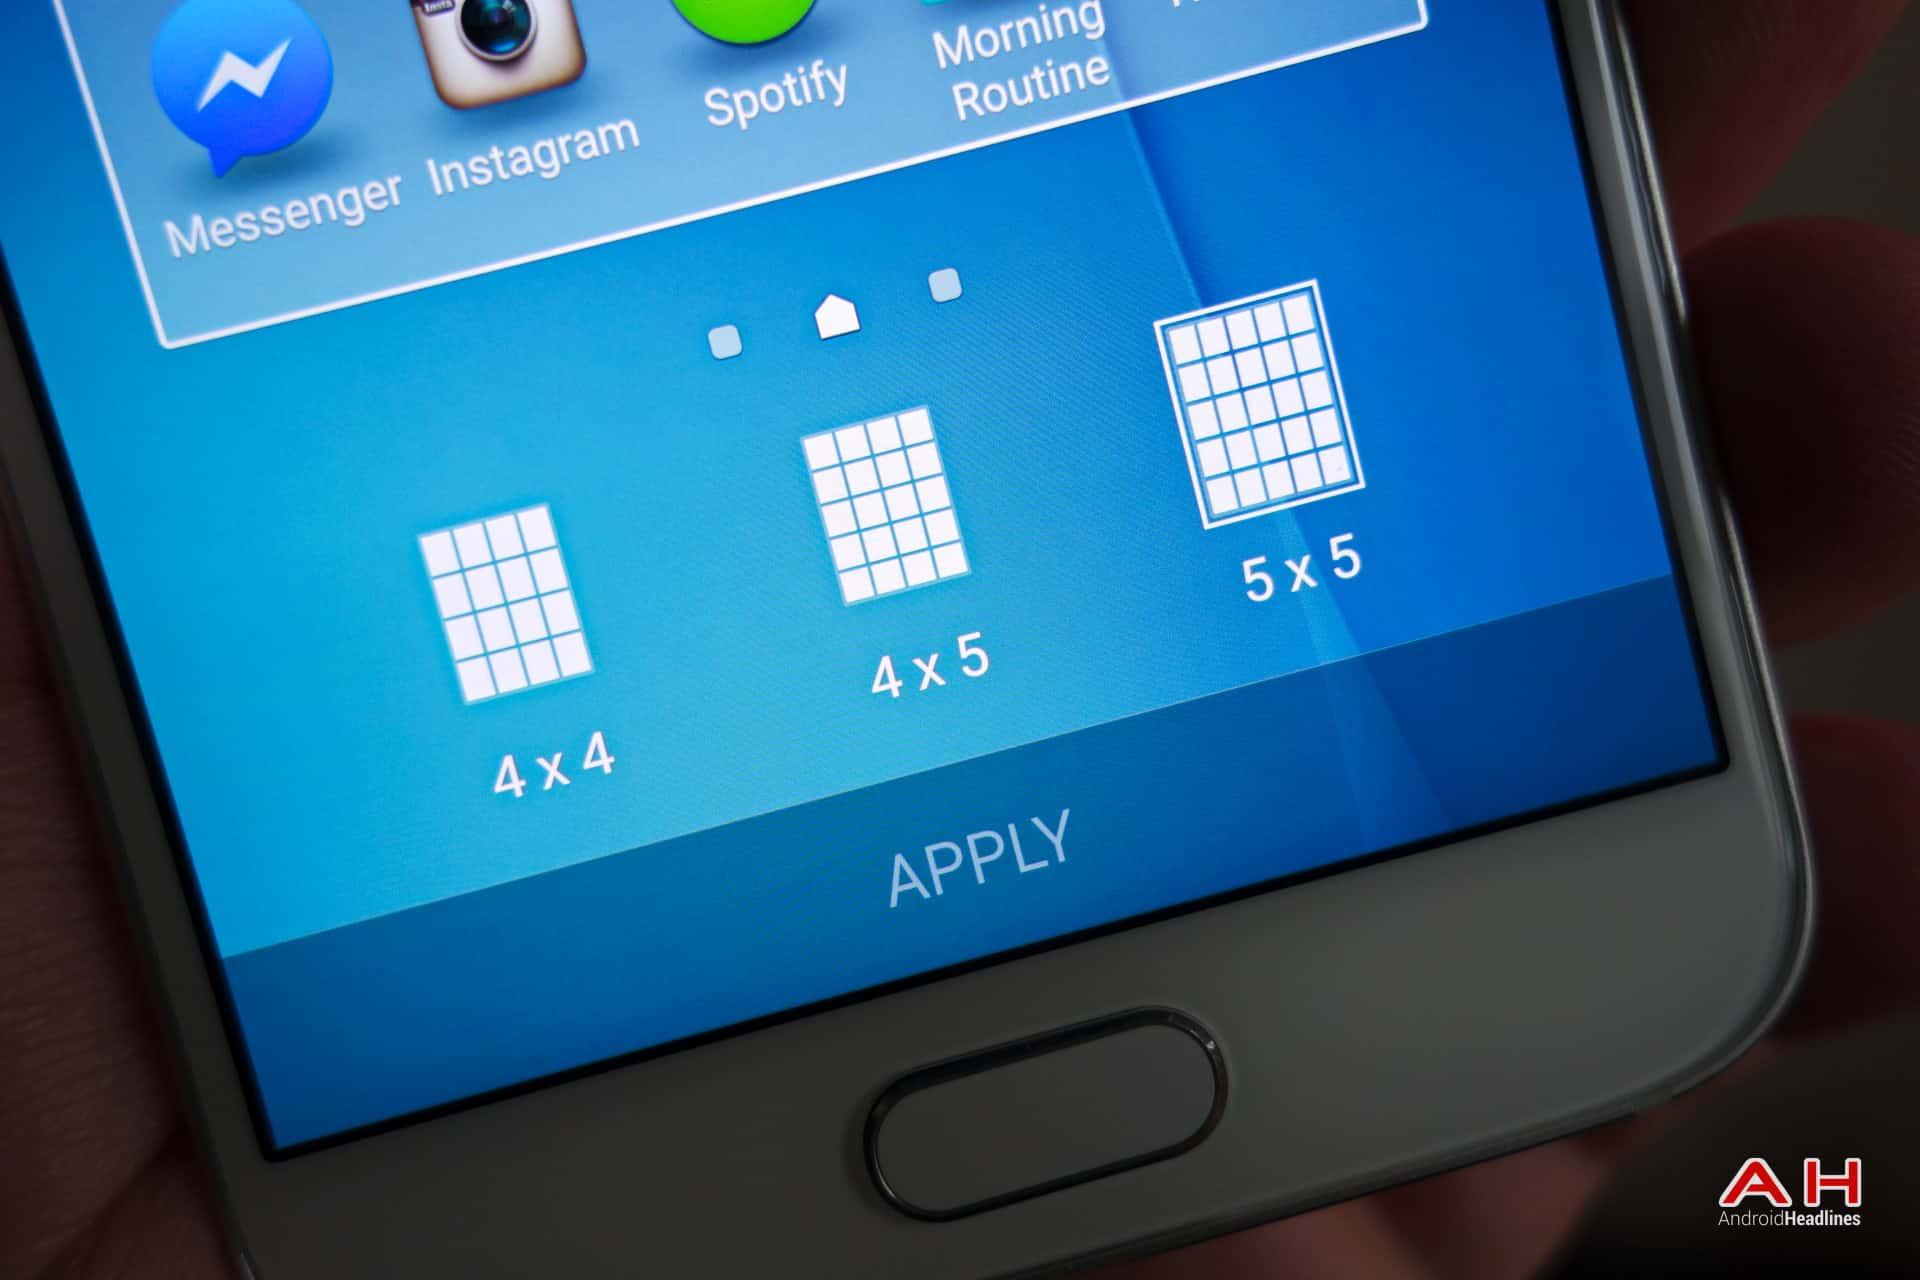 AH Samsung Galaxy S6-screen grid-2